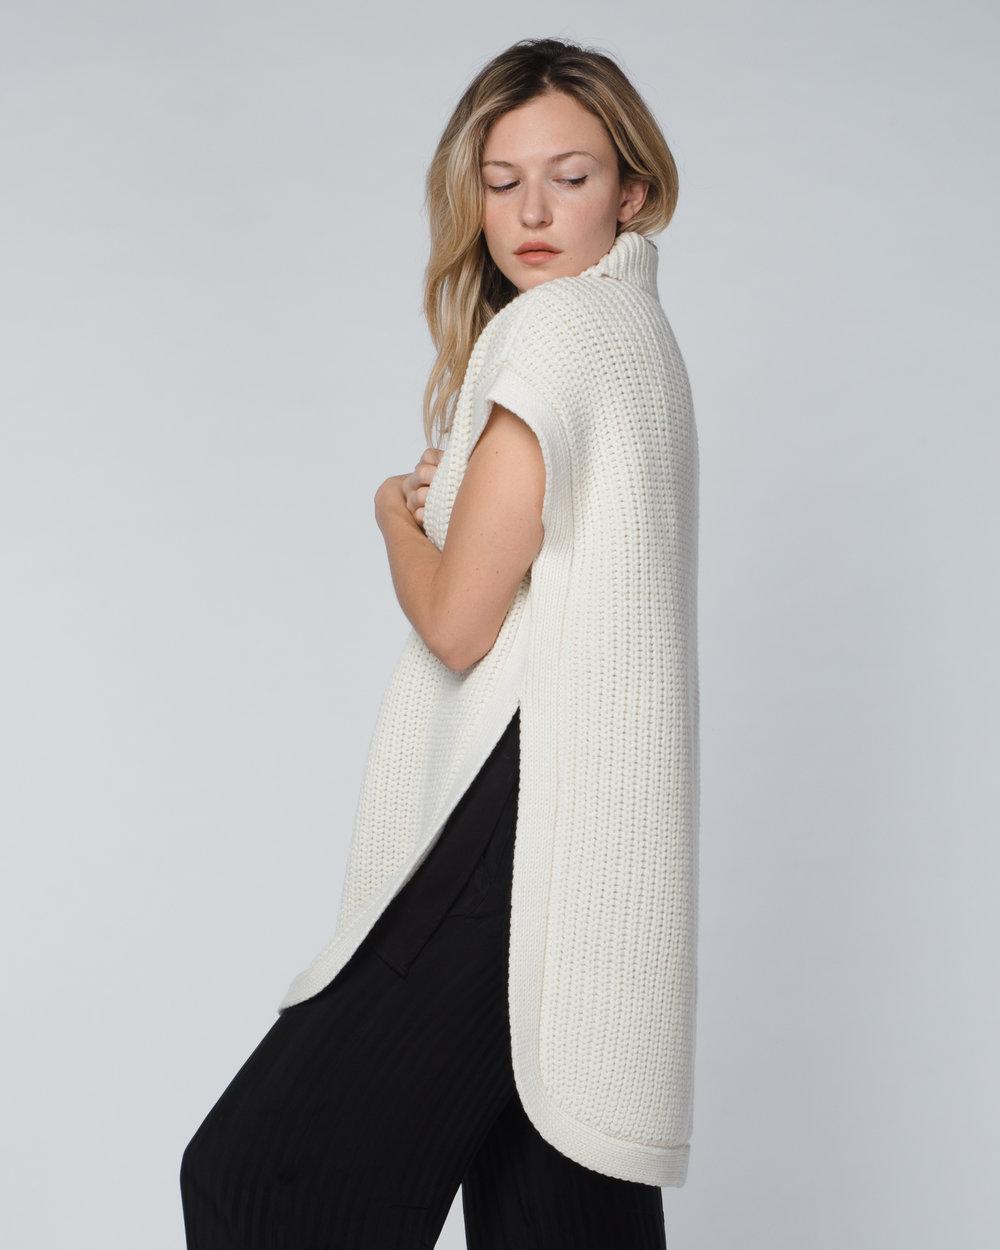 agoraphobia-collective-1x1-sleeveless-turtleneck-sweater-natural-white